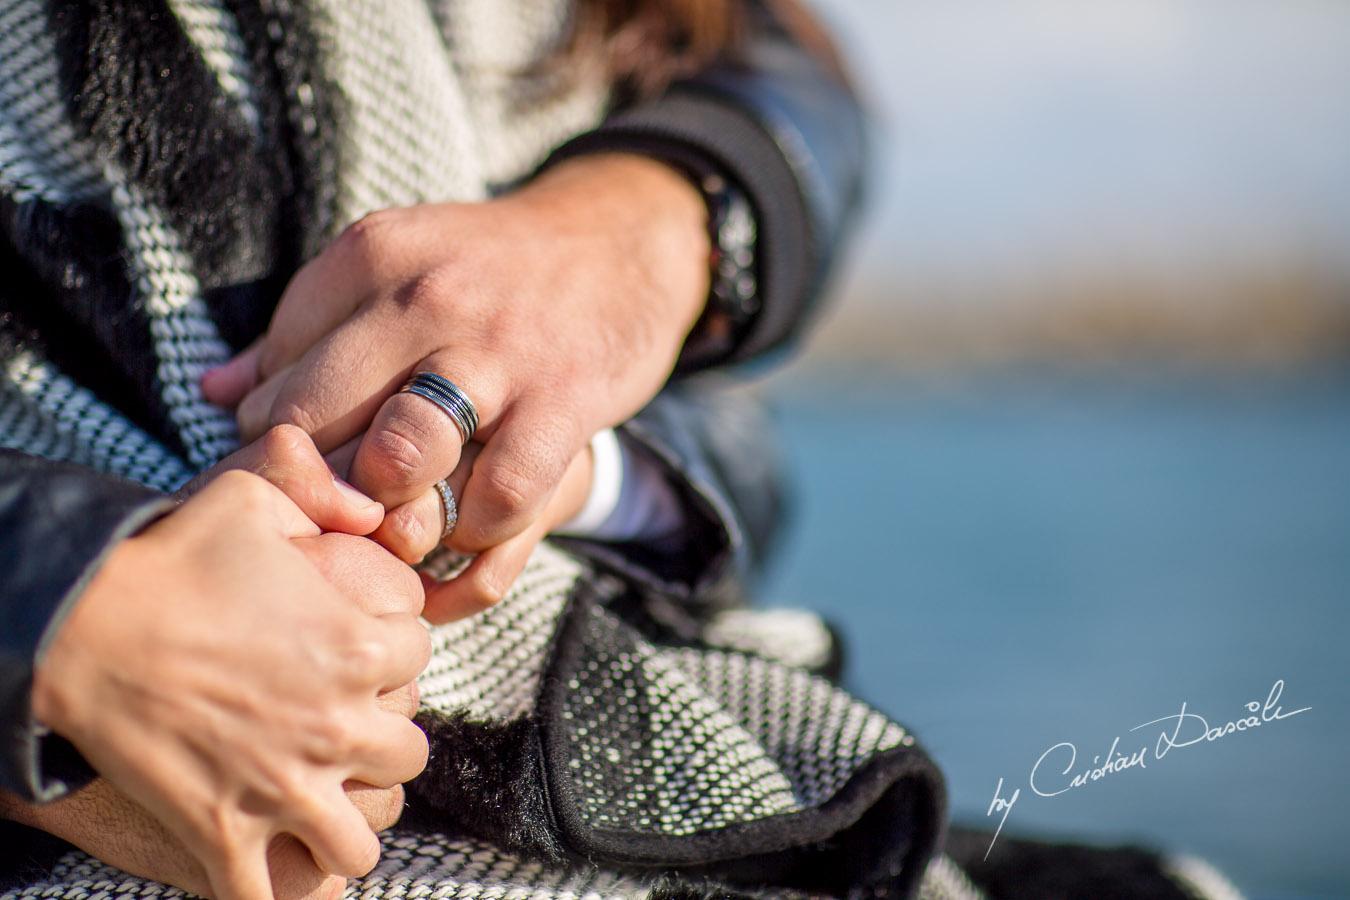 Cyprus Romantic Photos. Photographer: Cristian Dascalu